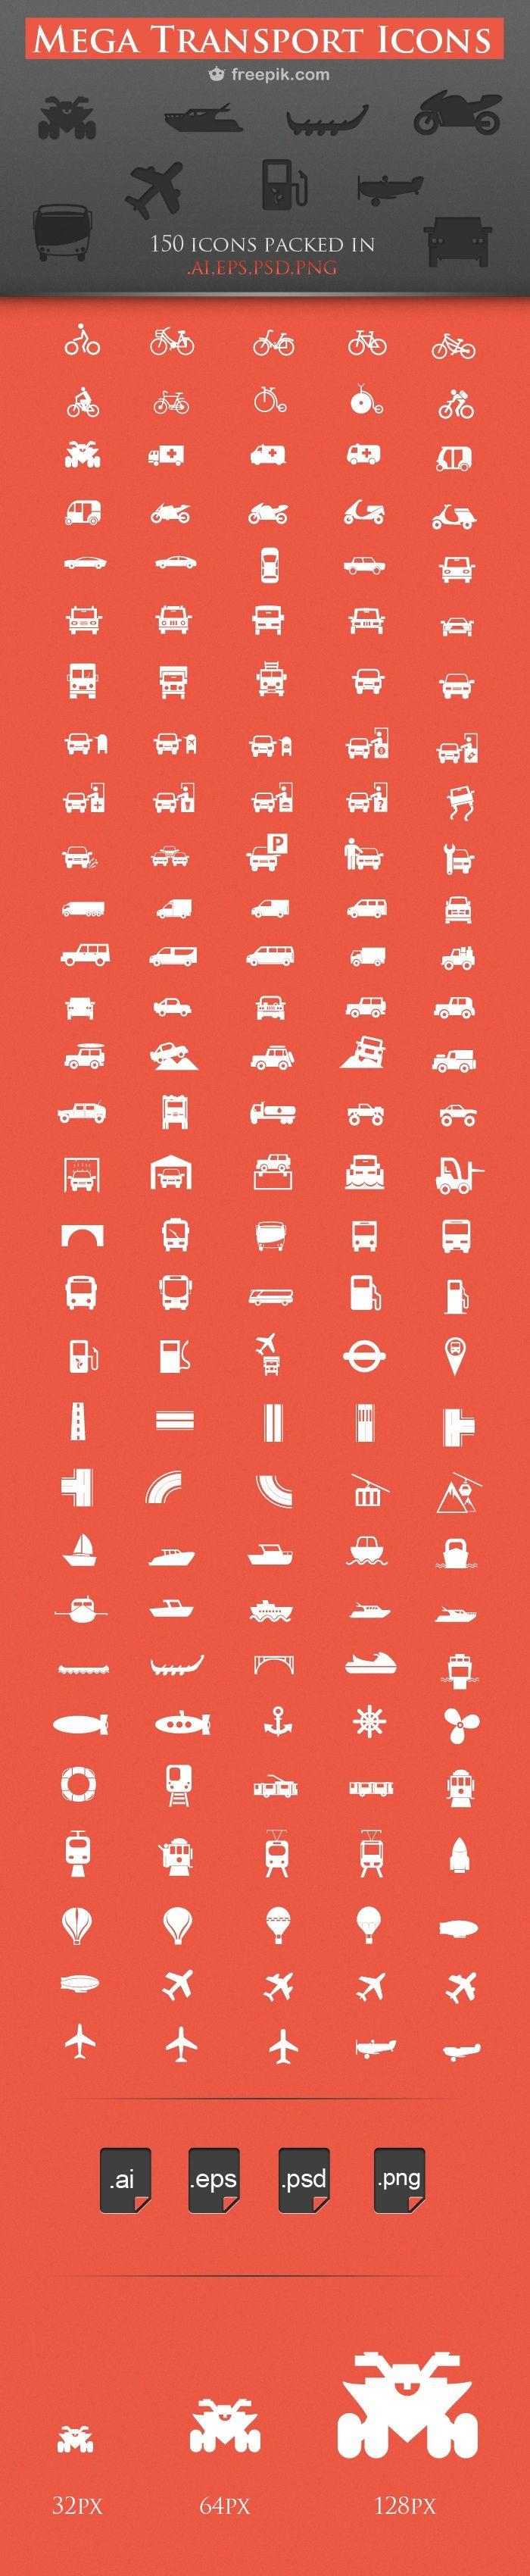 150 RoyaltyFree Transport Icons Pack for Download